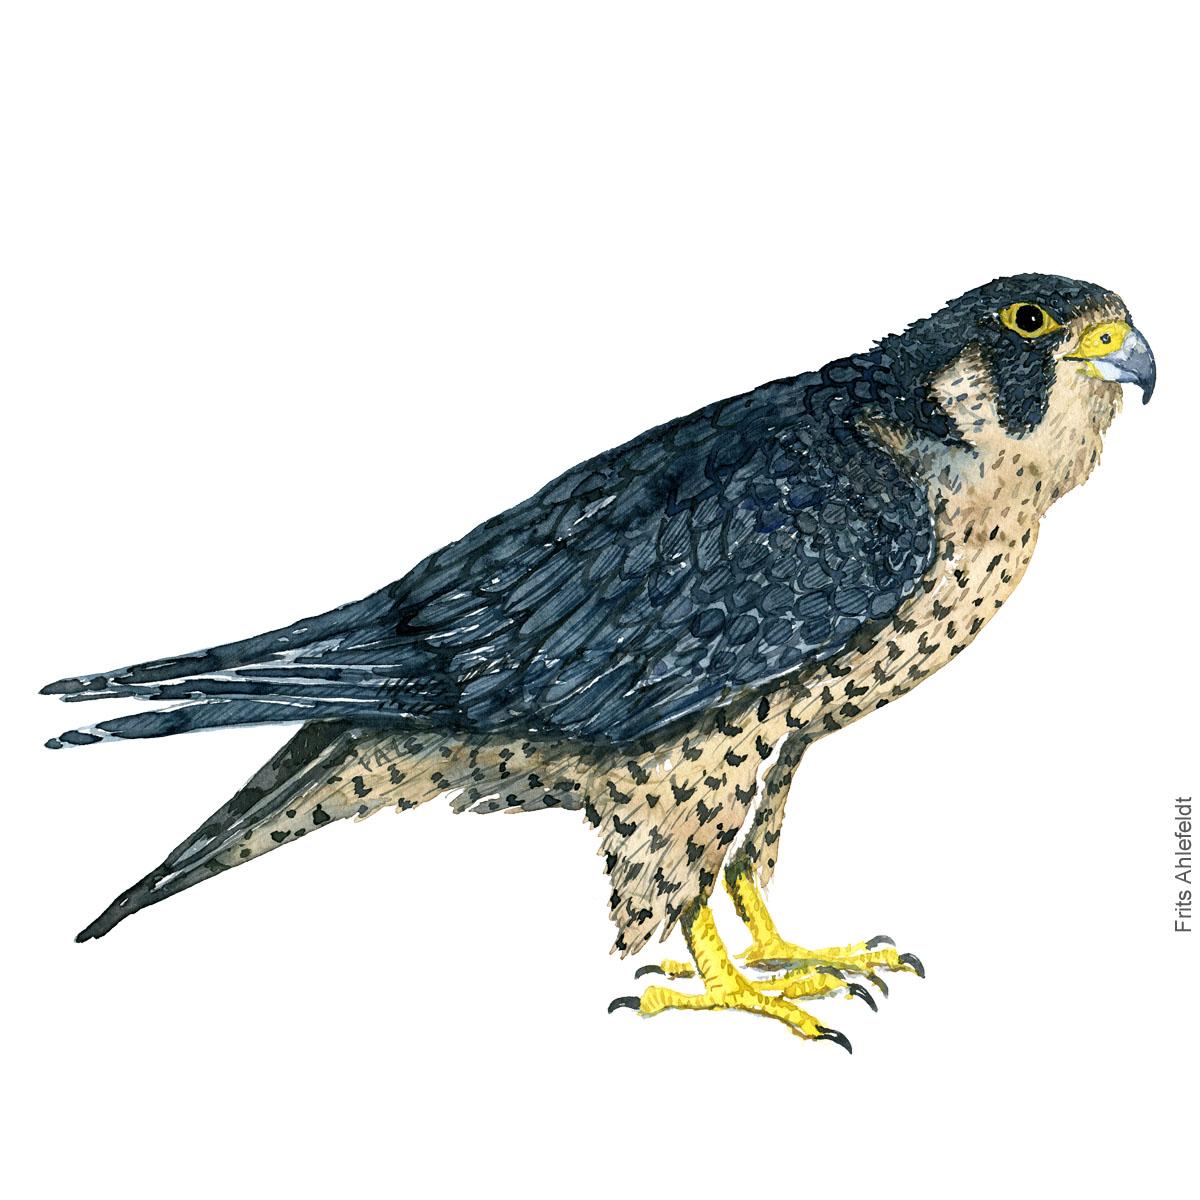 Dw00359 Peregrine falcon - Vandrefalk Akvarel. Watercolor bird illustration by Frits Ahlefeldt